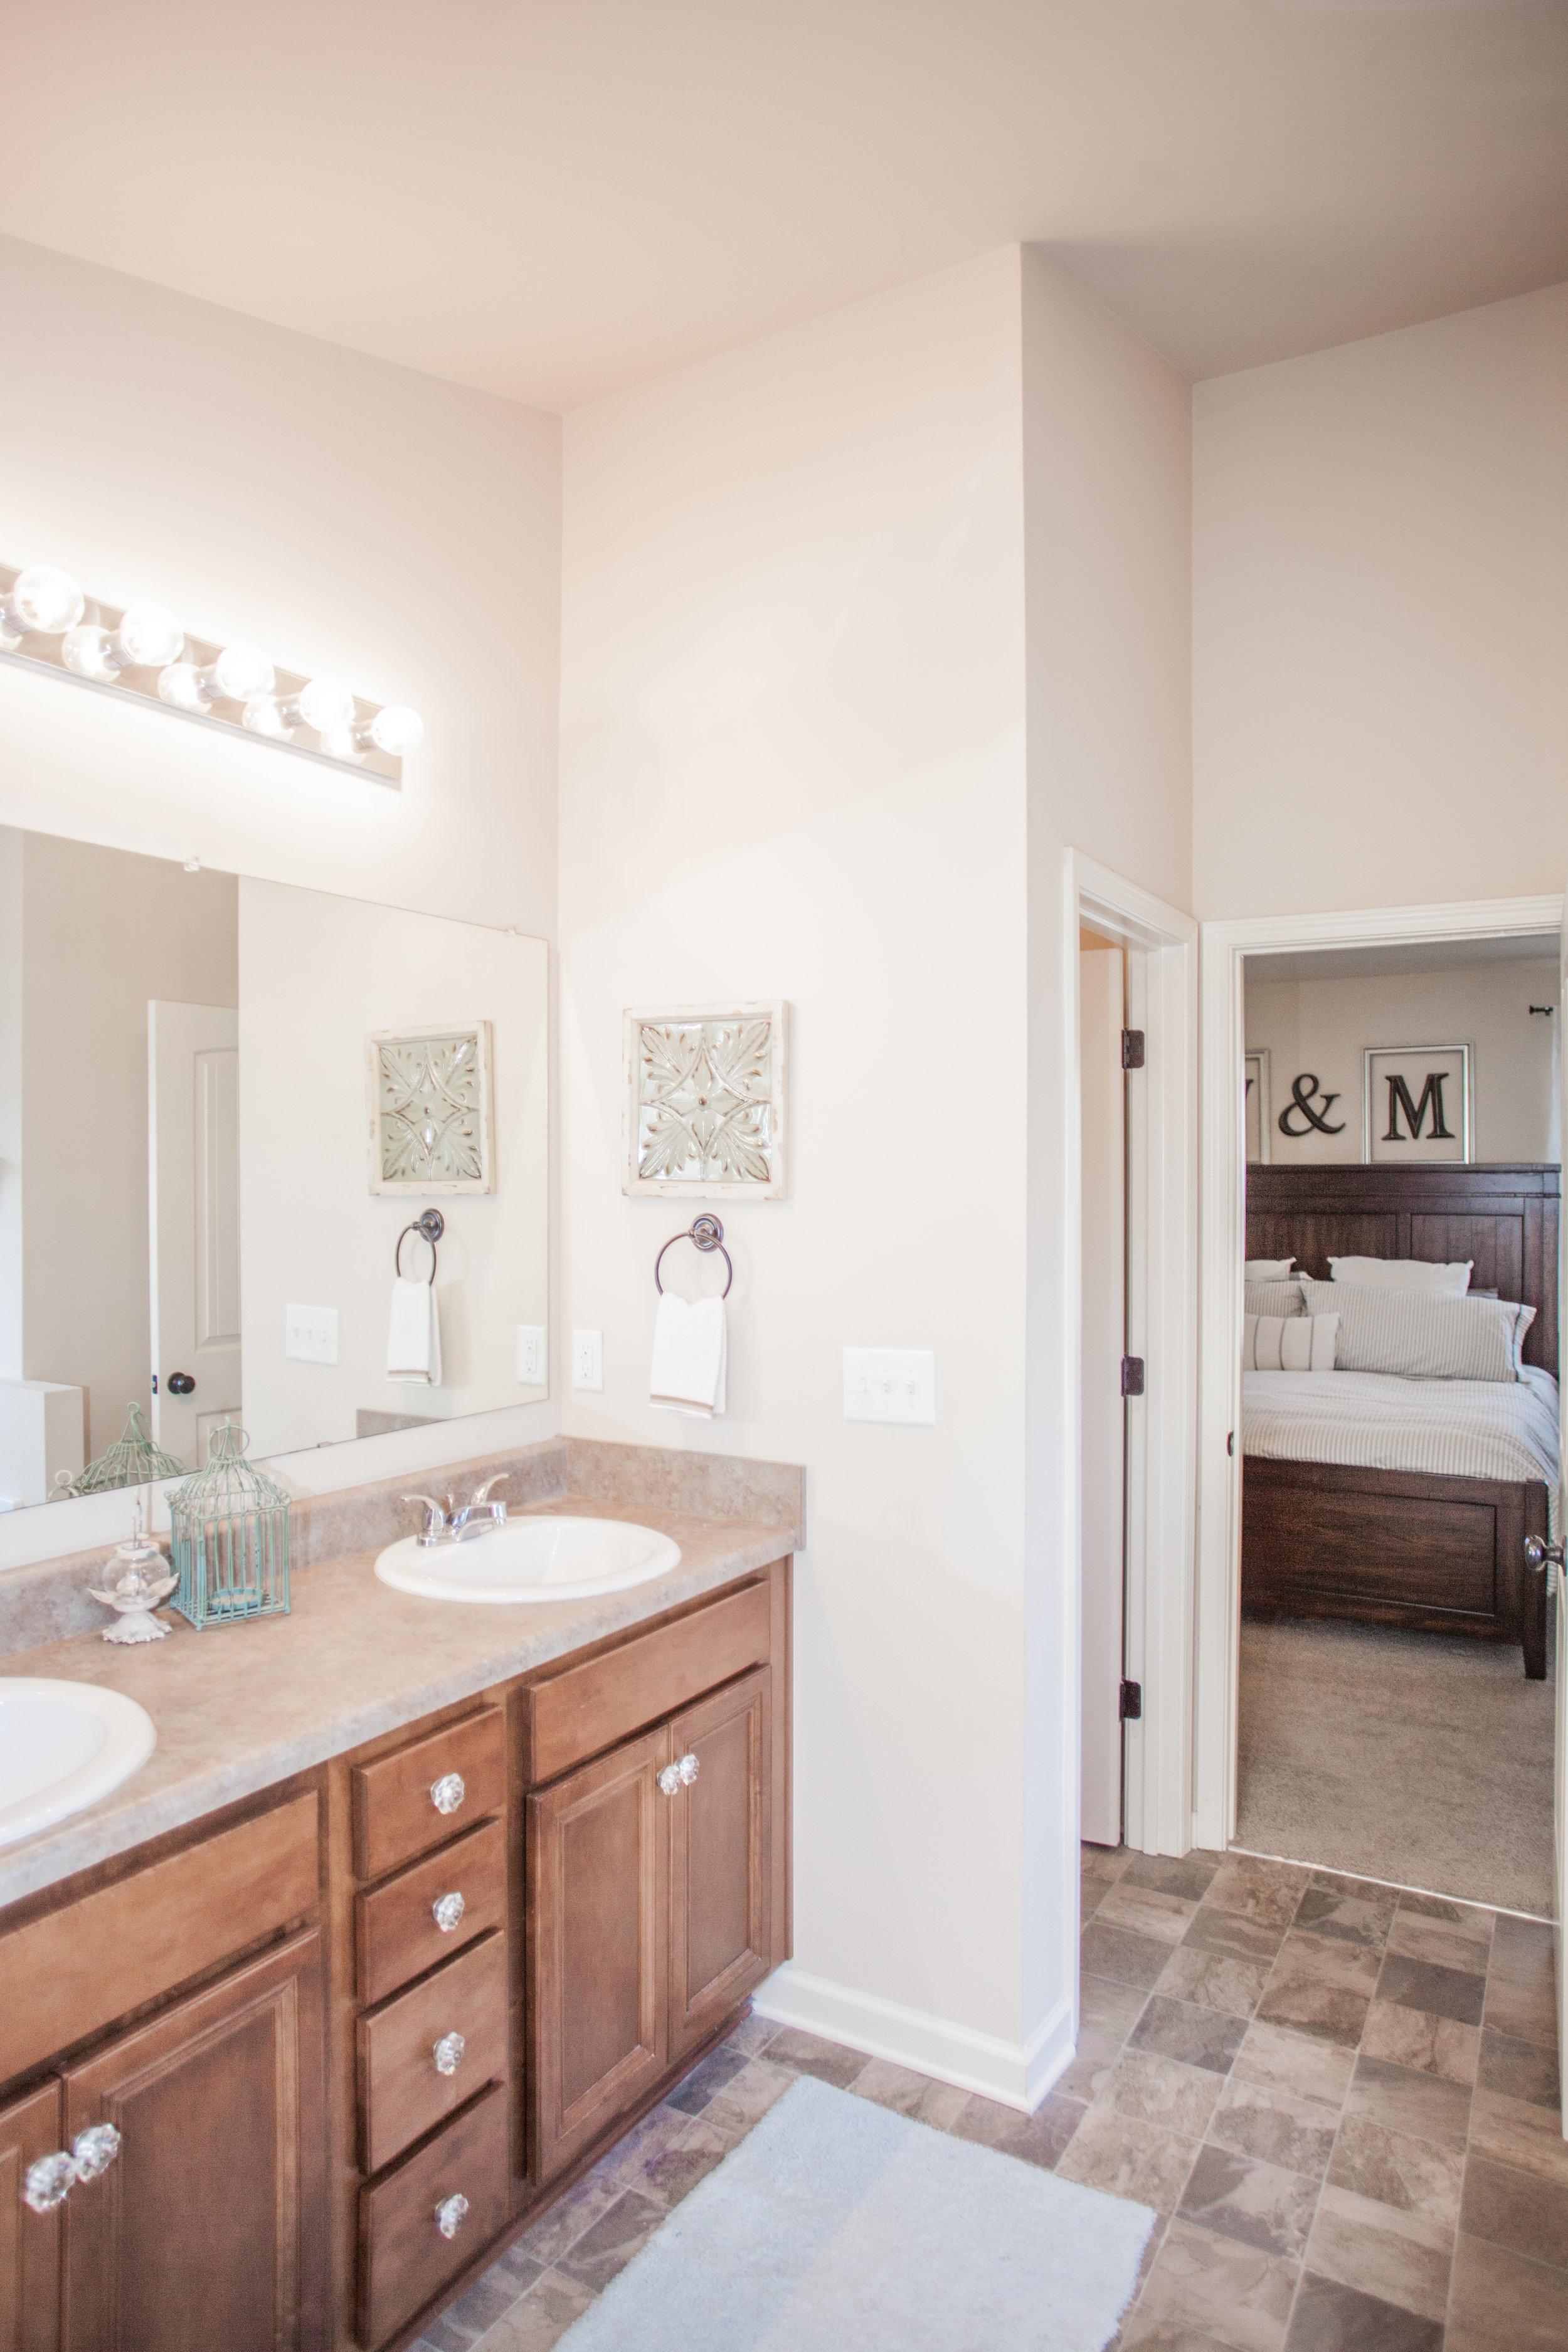 woodstock-ga-house-for-sale-wingard-real-estate-under-300k-23.jpg